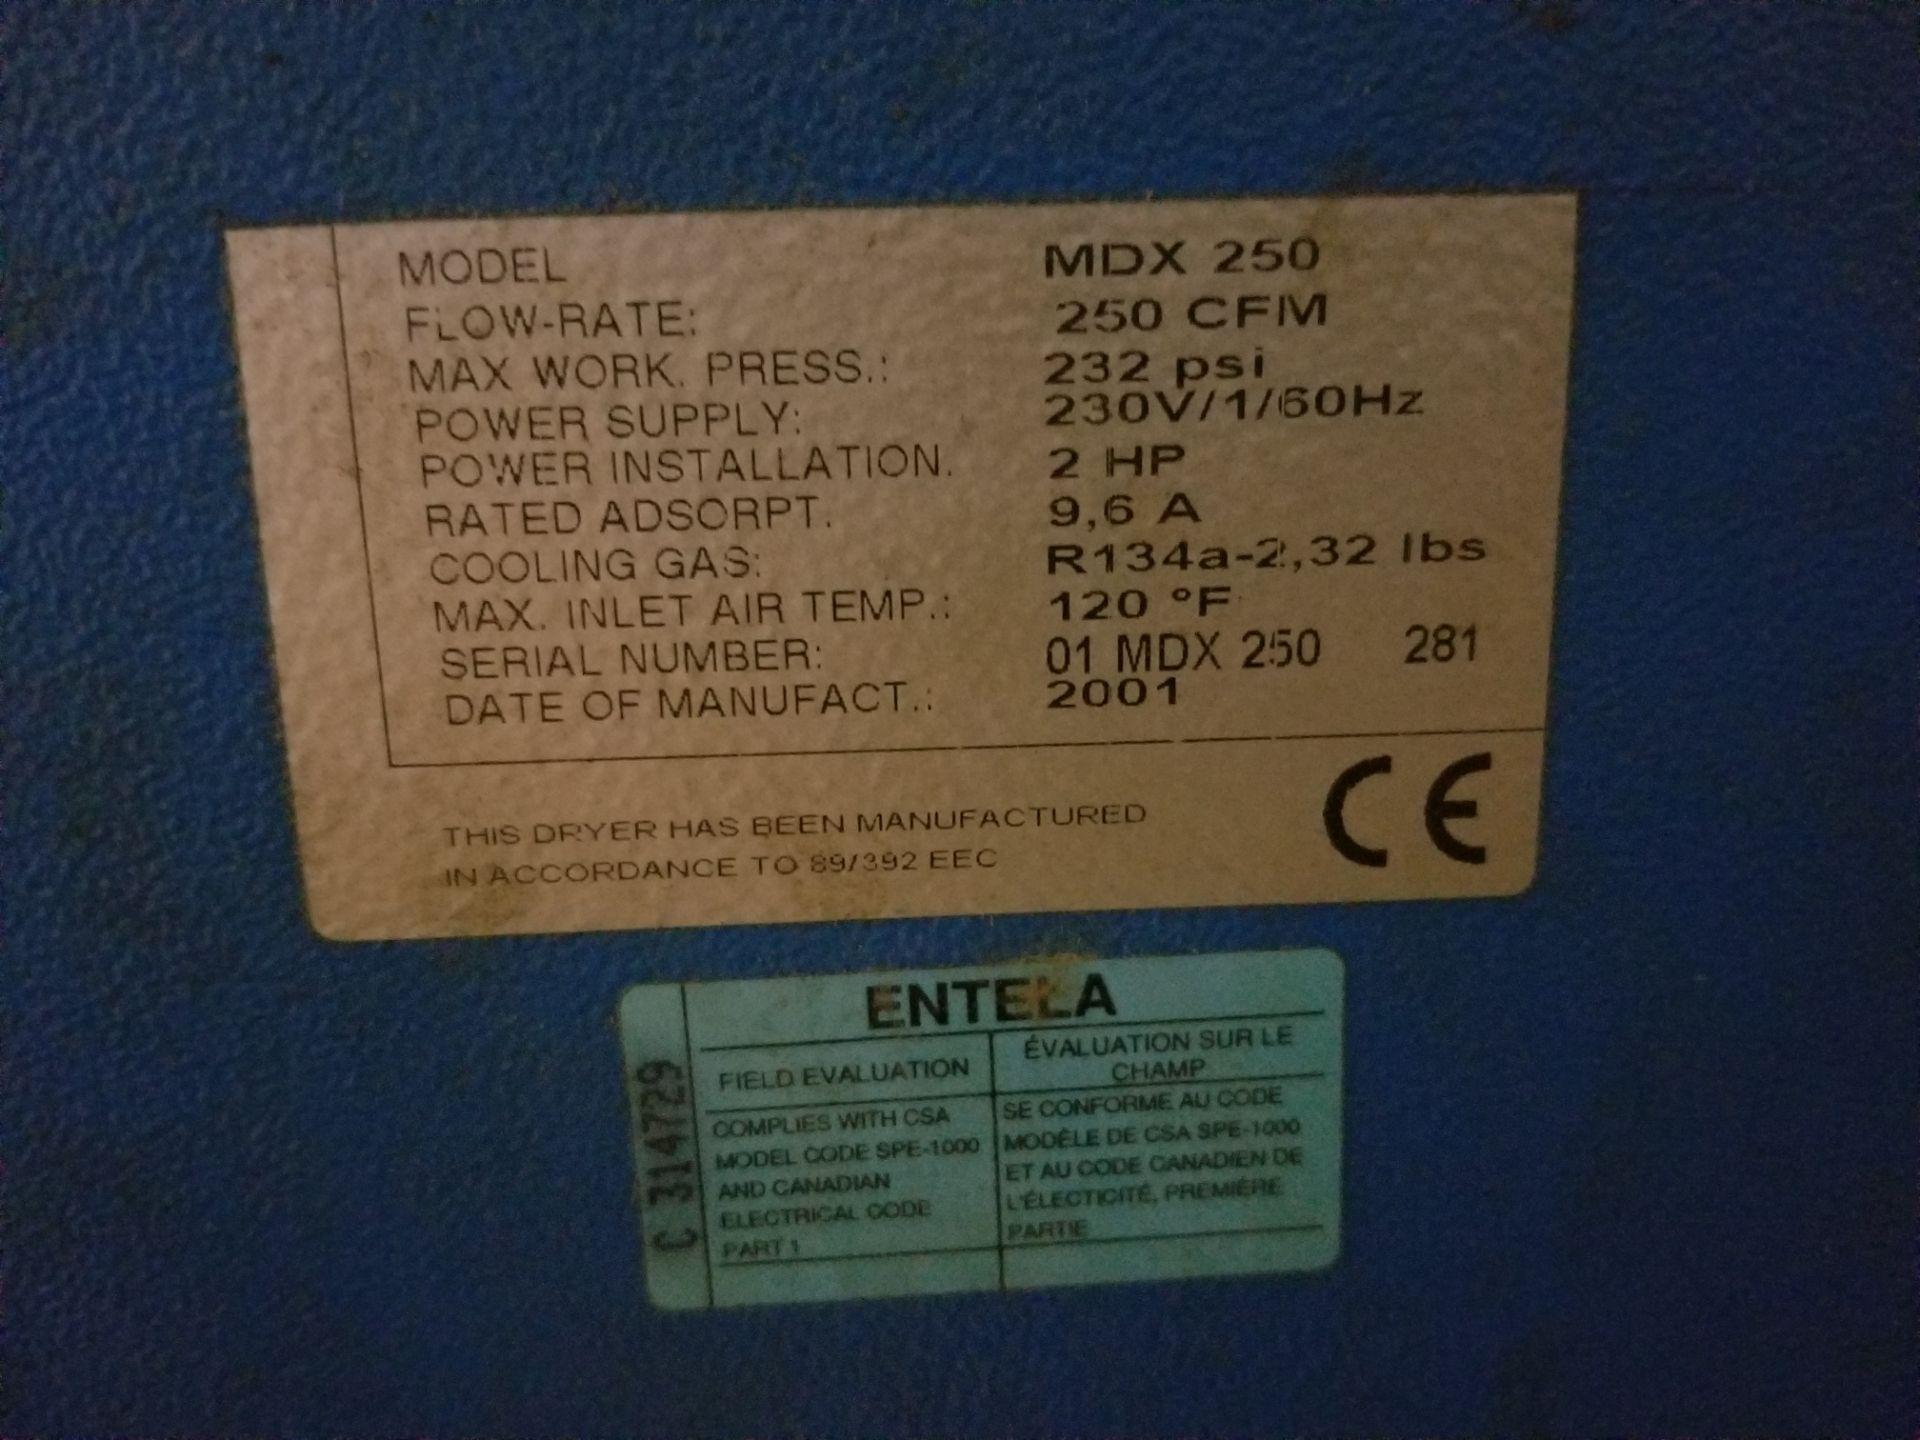 575 volt compressor, dryer, cooler / Compresseur 575 volts, assécheur - Image 4 of 4